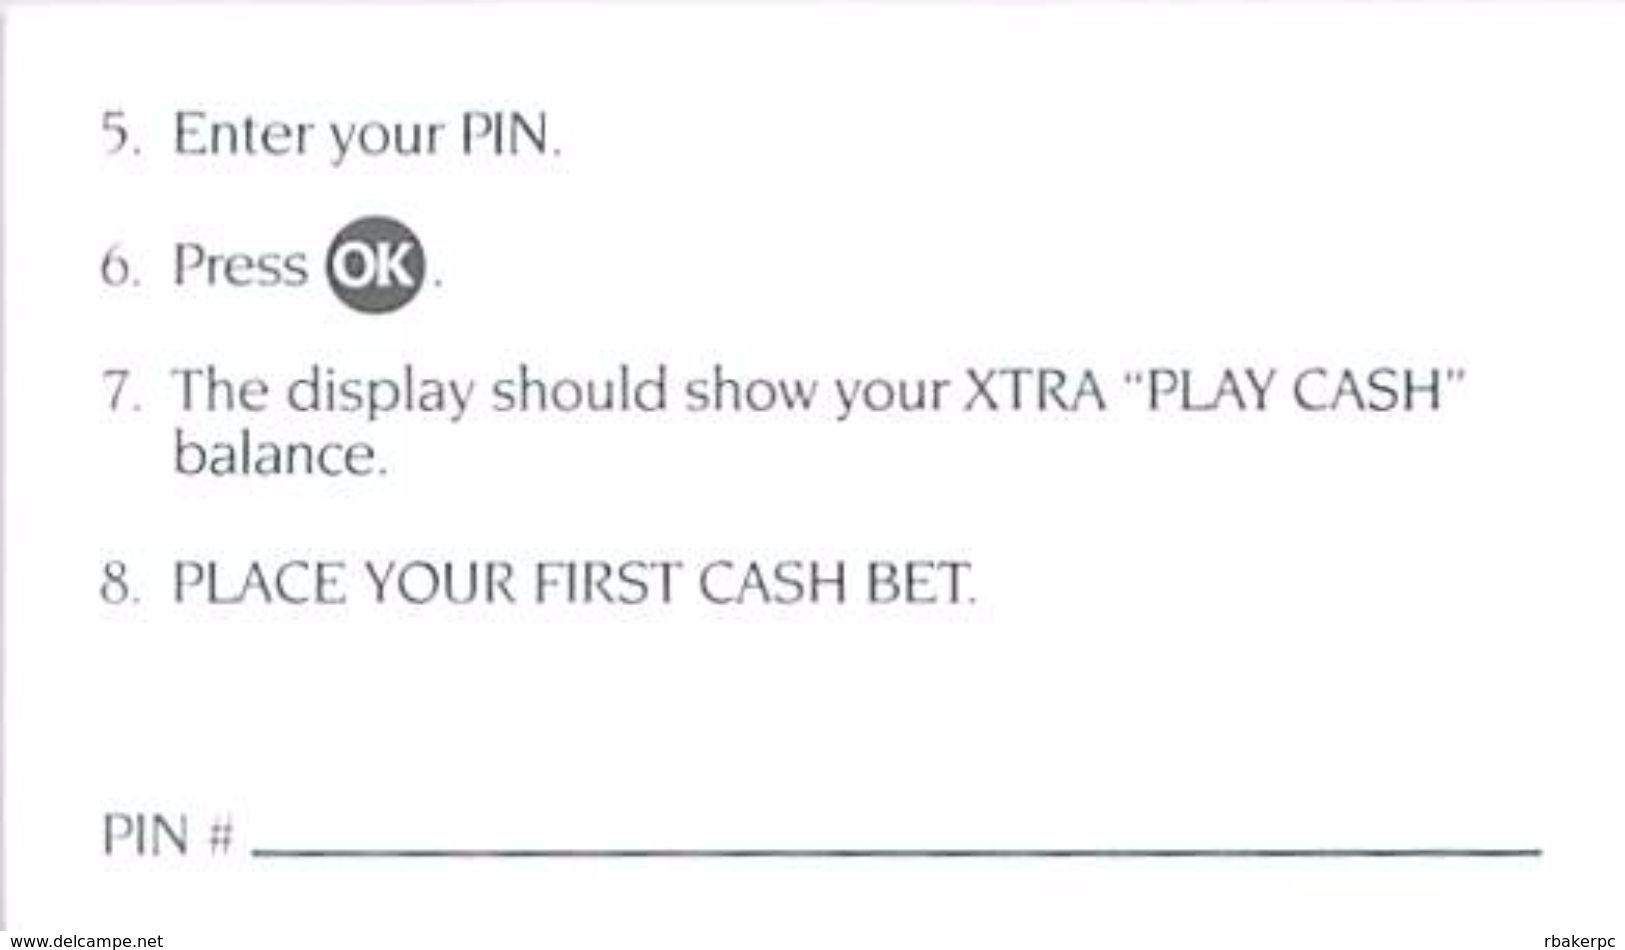 Generic Station Casinos - Las Vegas, NV - Xtra Playcash Instructions Card (No Logo) - Casino Cards